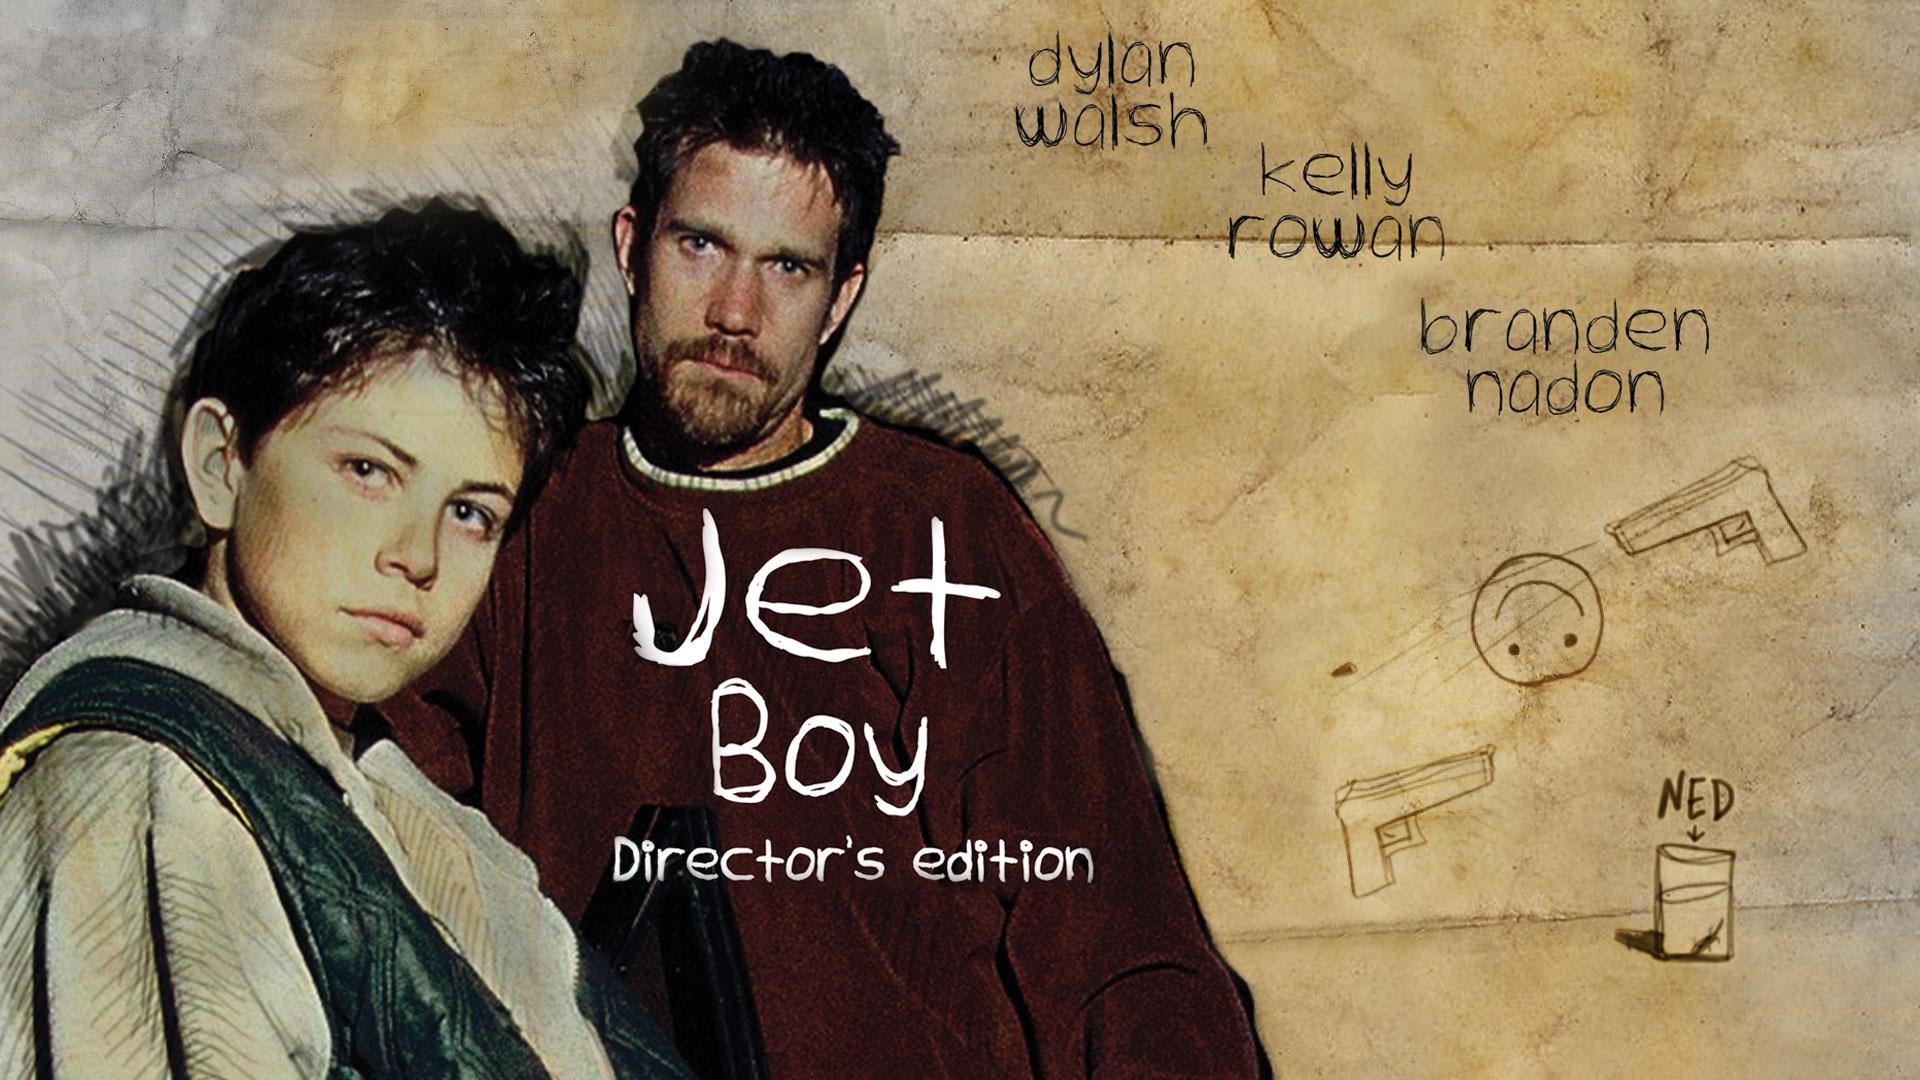 Jet Boy - Director's Edition